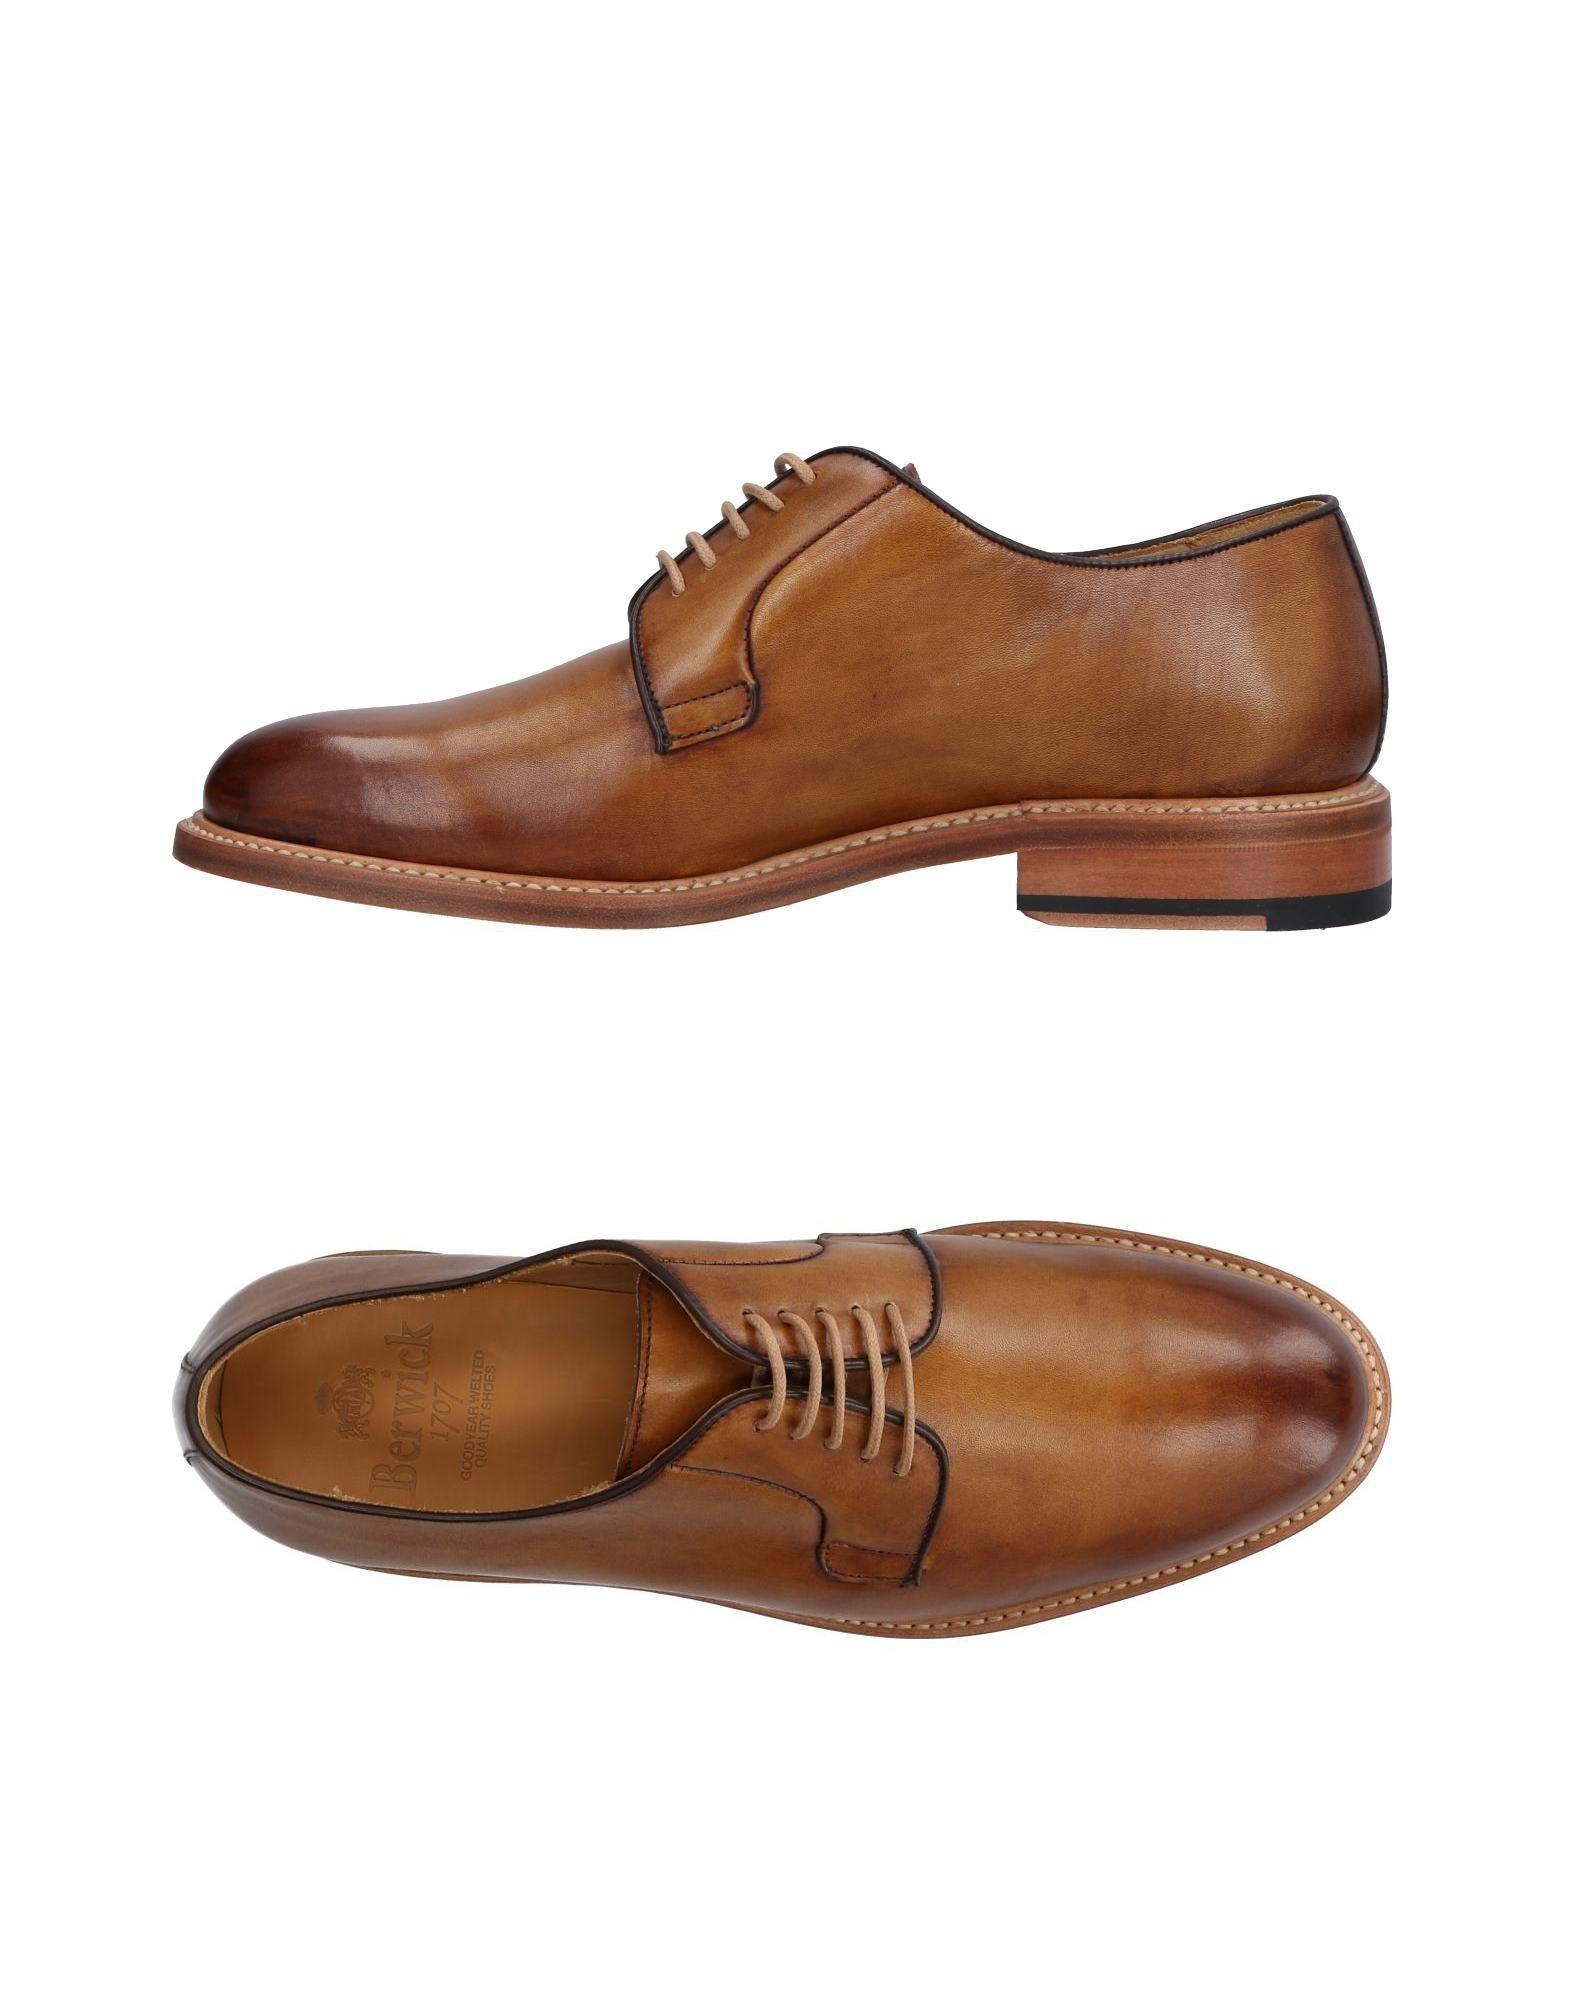 Rabatt echte Schnürschuhe Schuhe Berwick  1707 Schnürschuhe echte Herren  11486280KQ c0a138